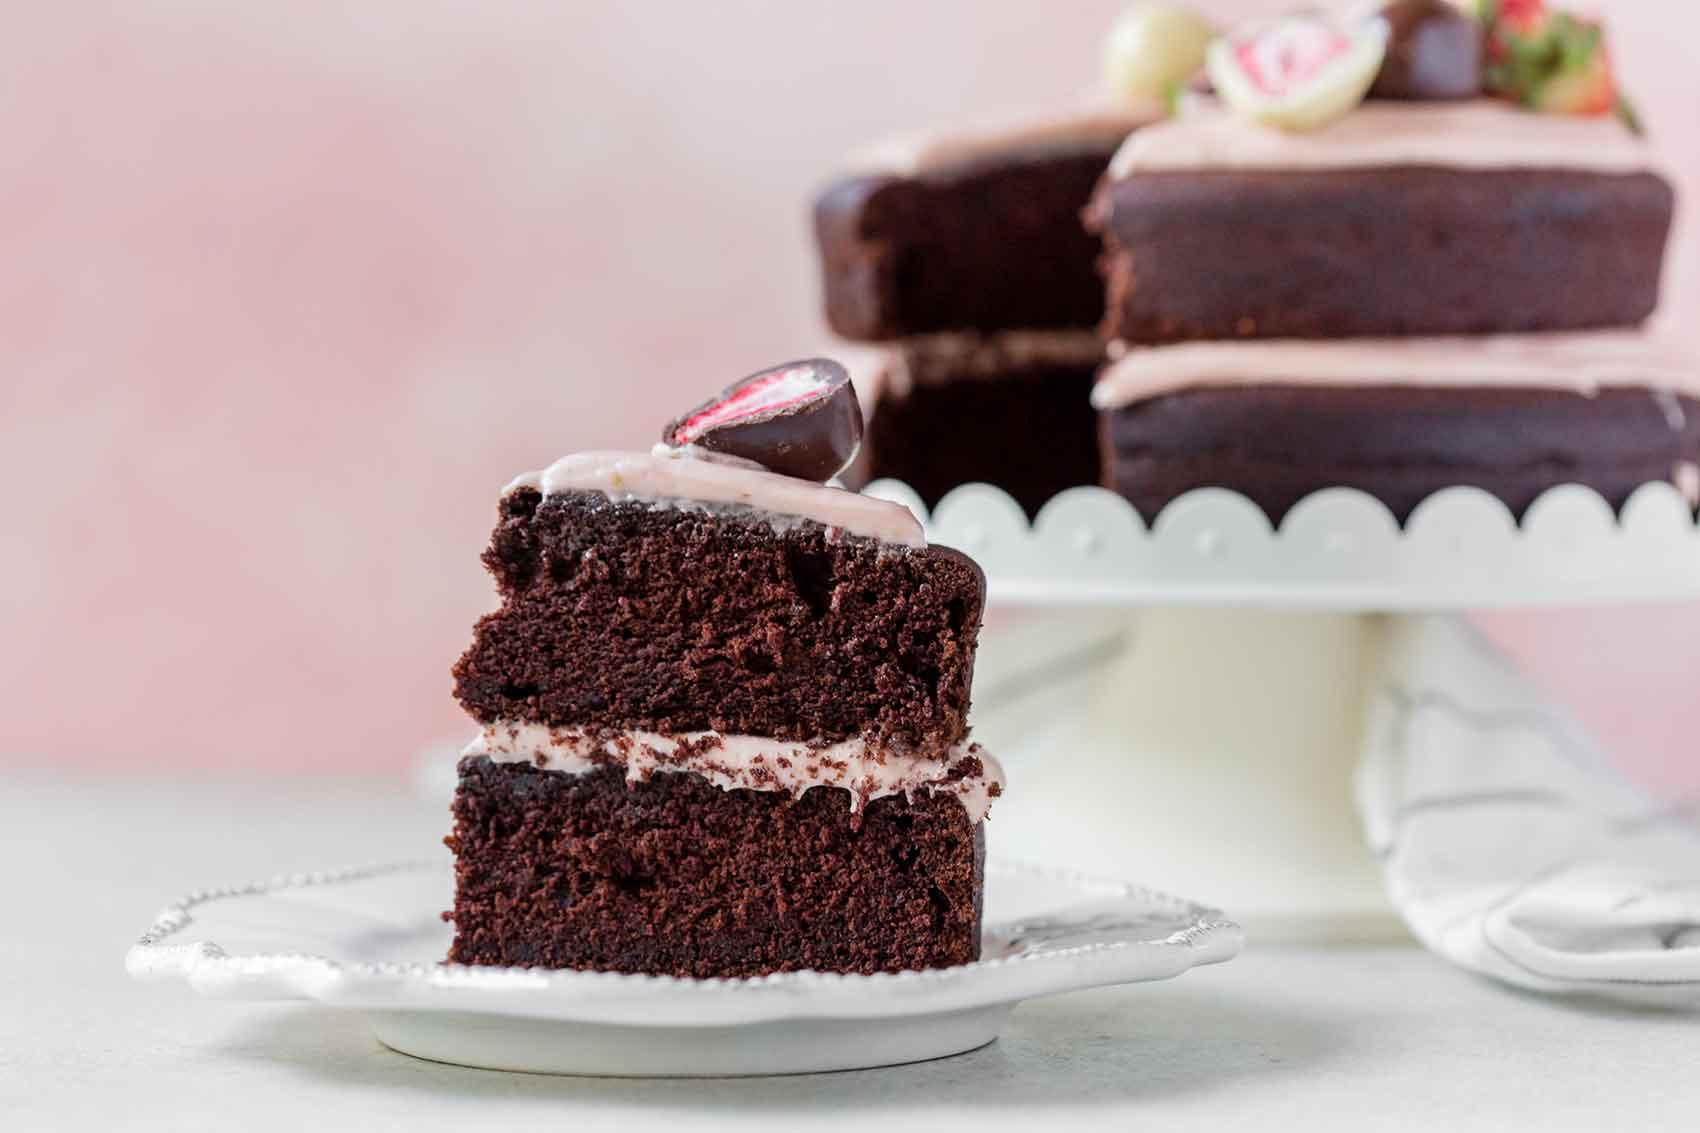 A slice of a strawberry chocolate cake